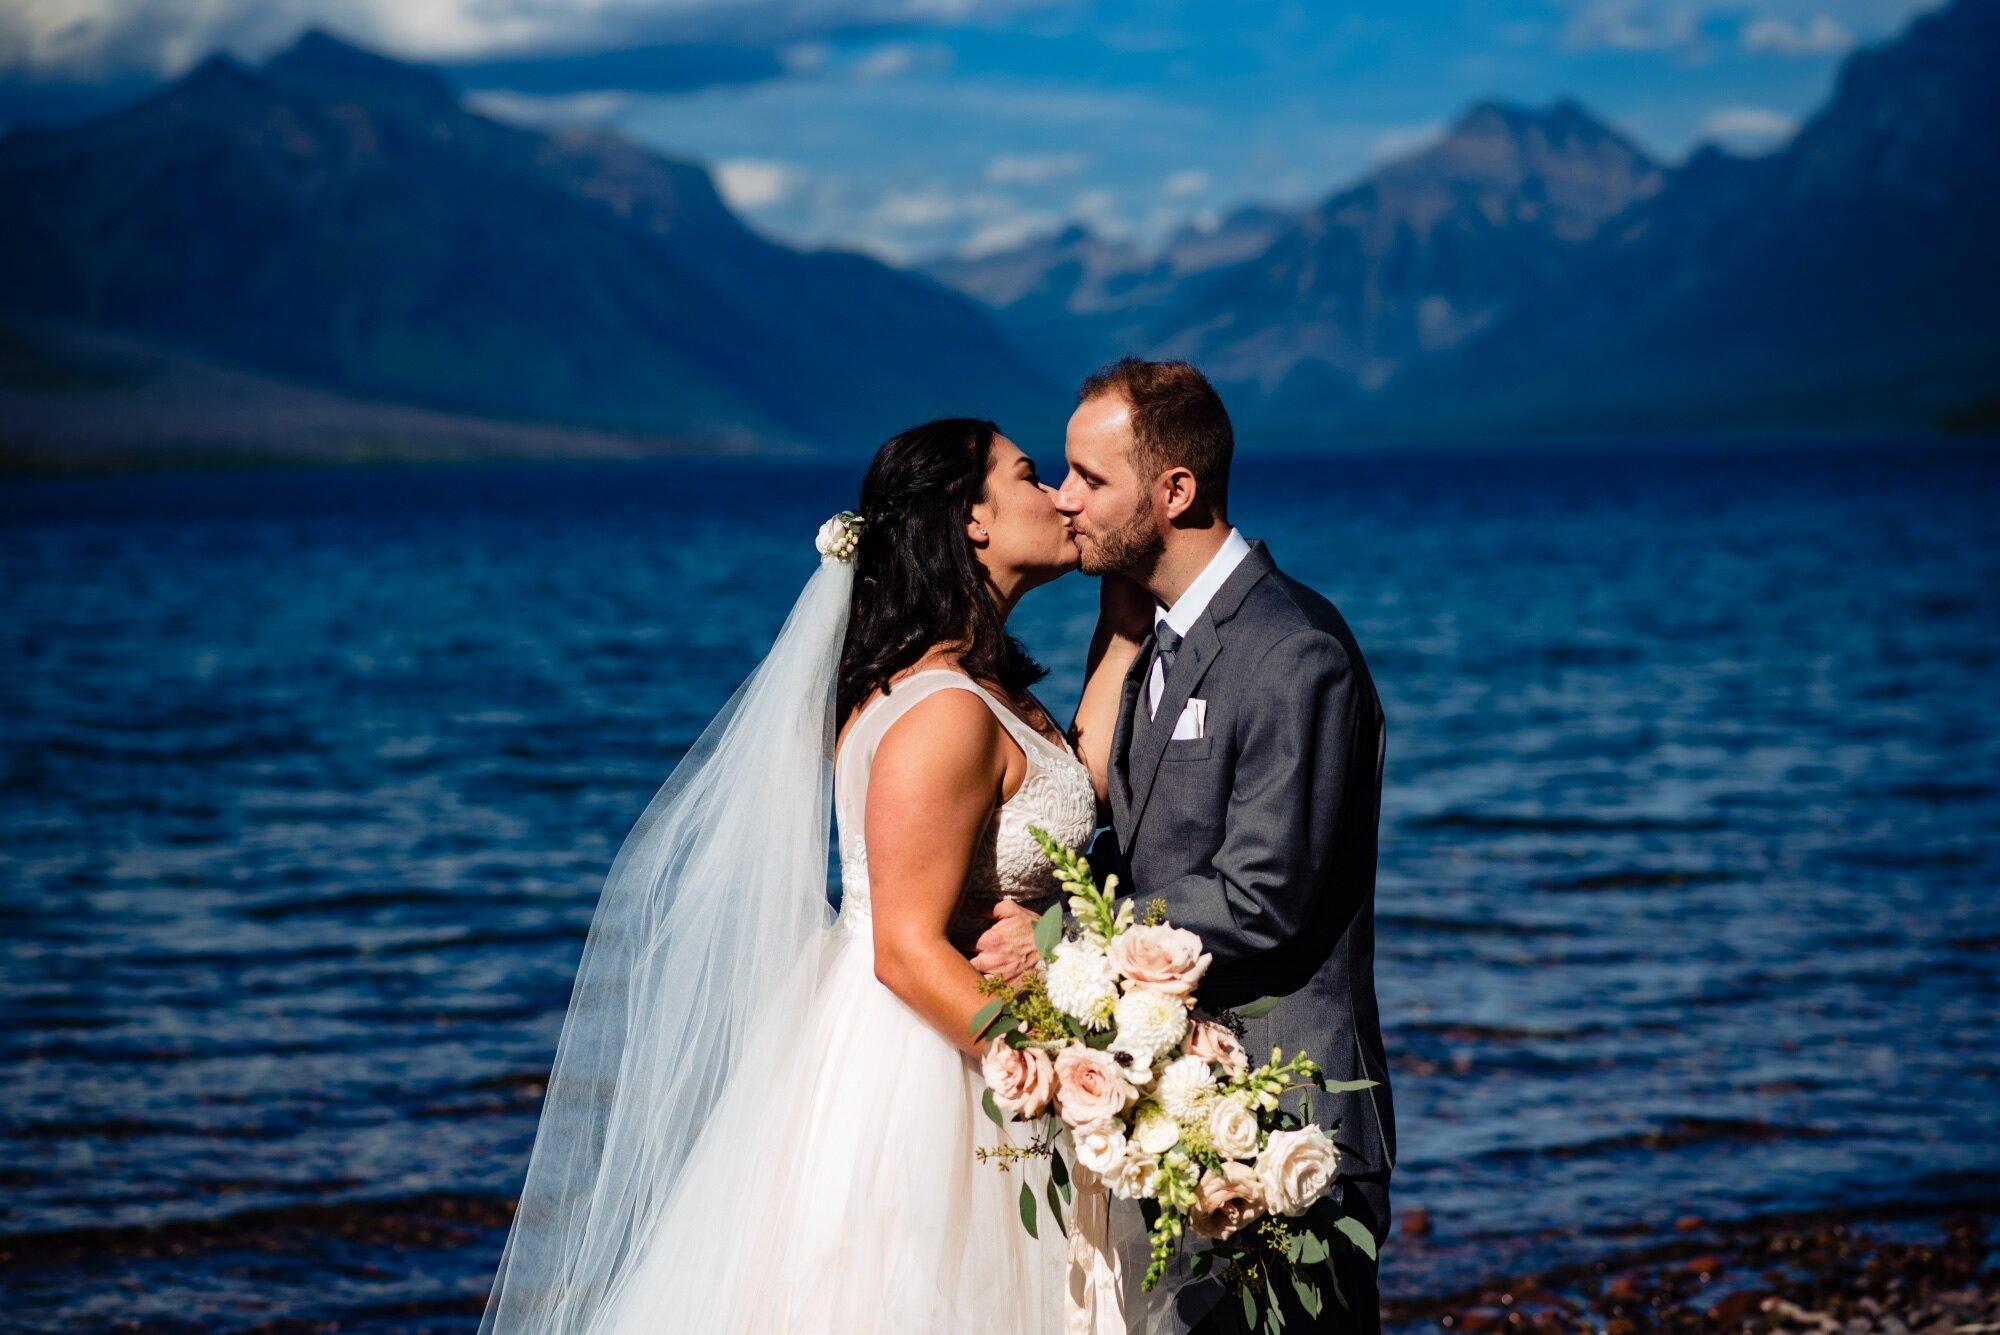 lindseyjanephoto_elopement0032.jpg